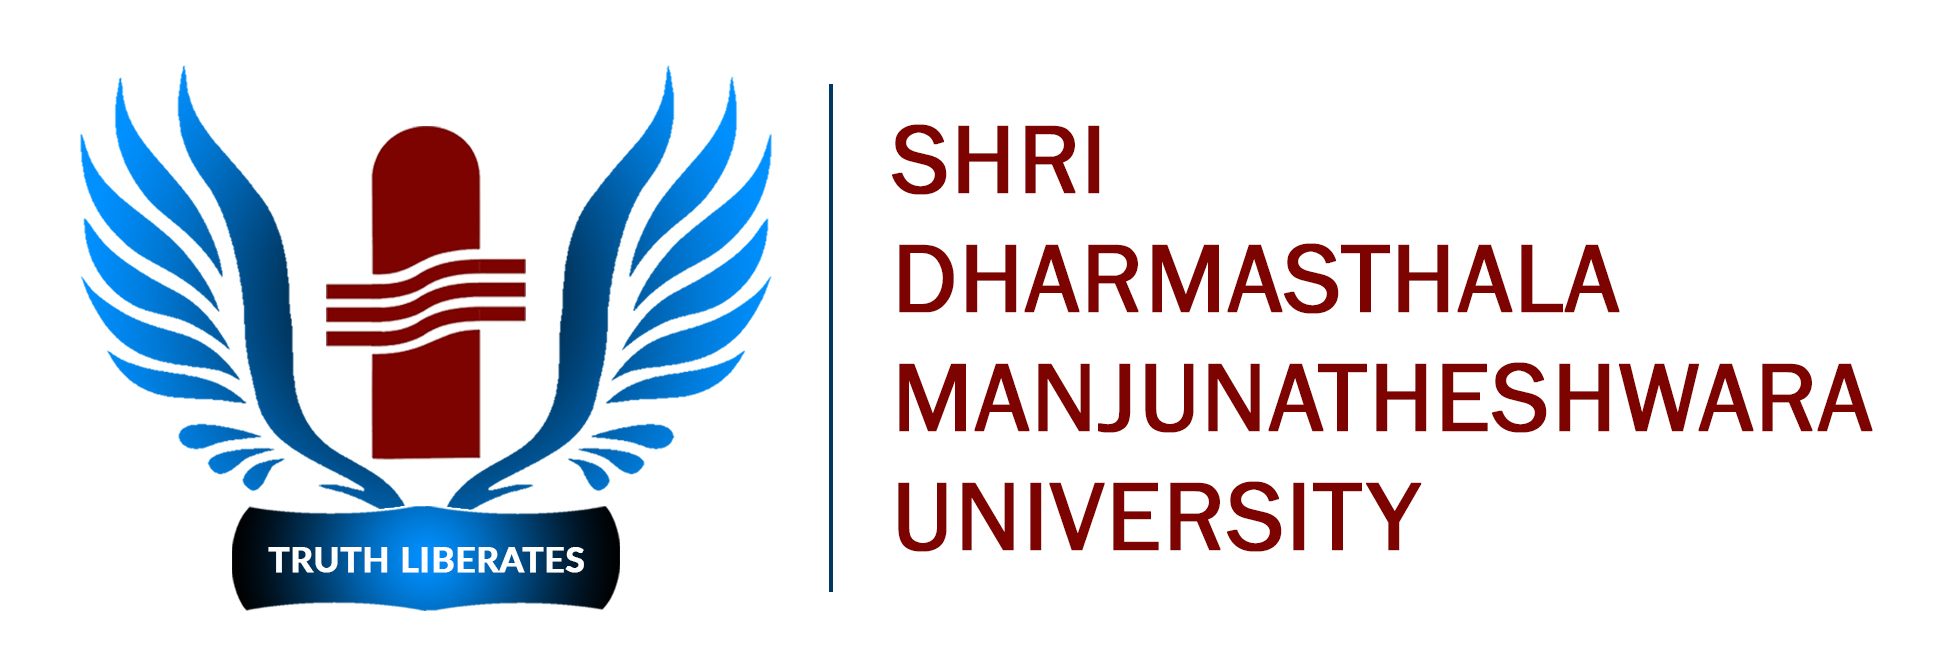 Shri Dharmasthala Manjunatheshwara University, Dharwad